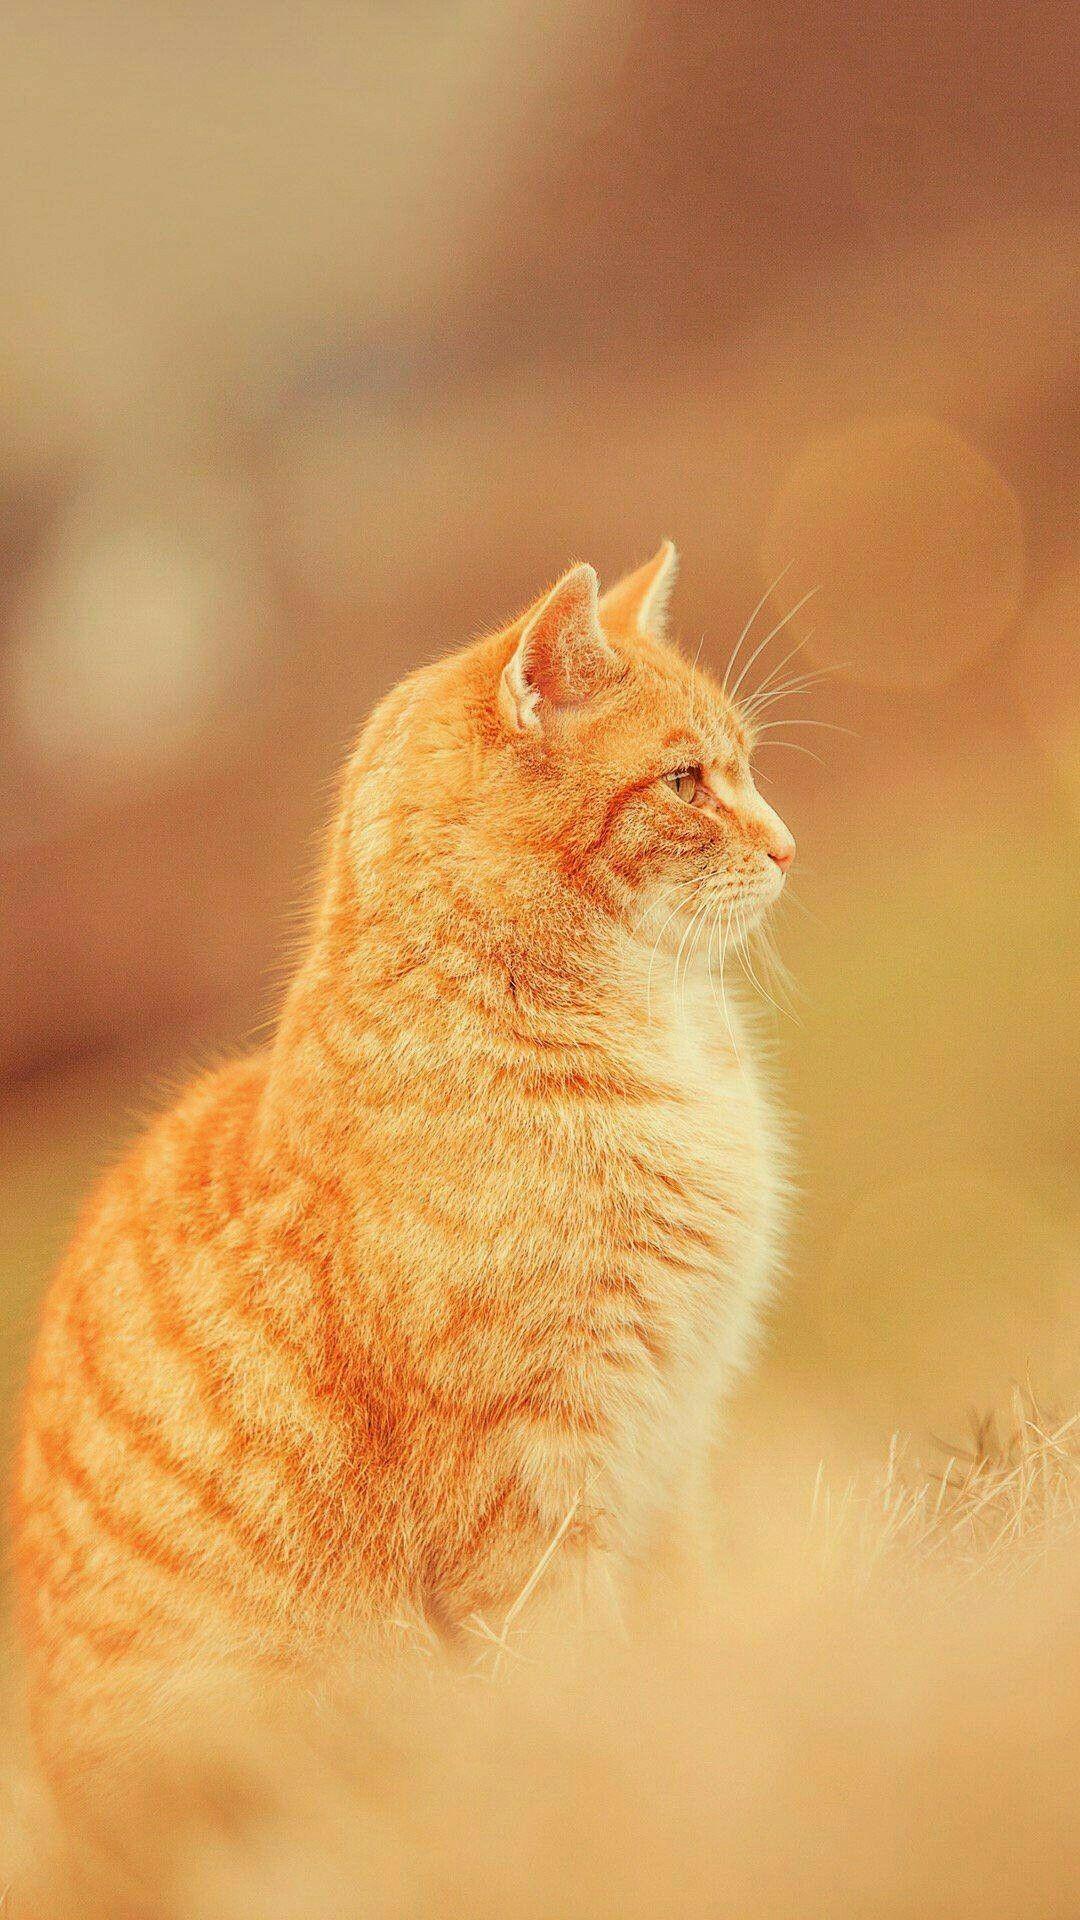 Orange Tabby Cat Wallpaper Orange Tabby Cats Ginger Cats